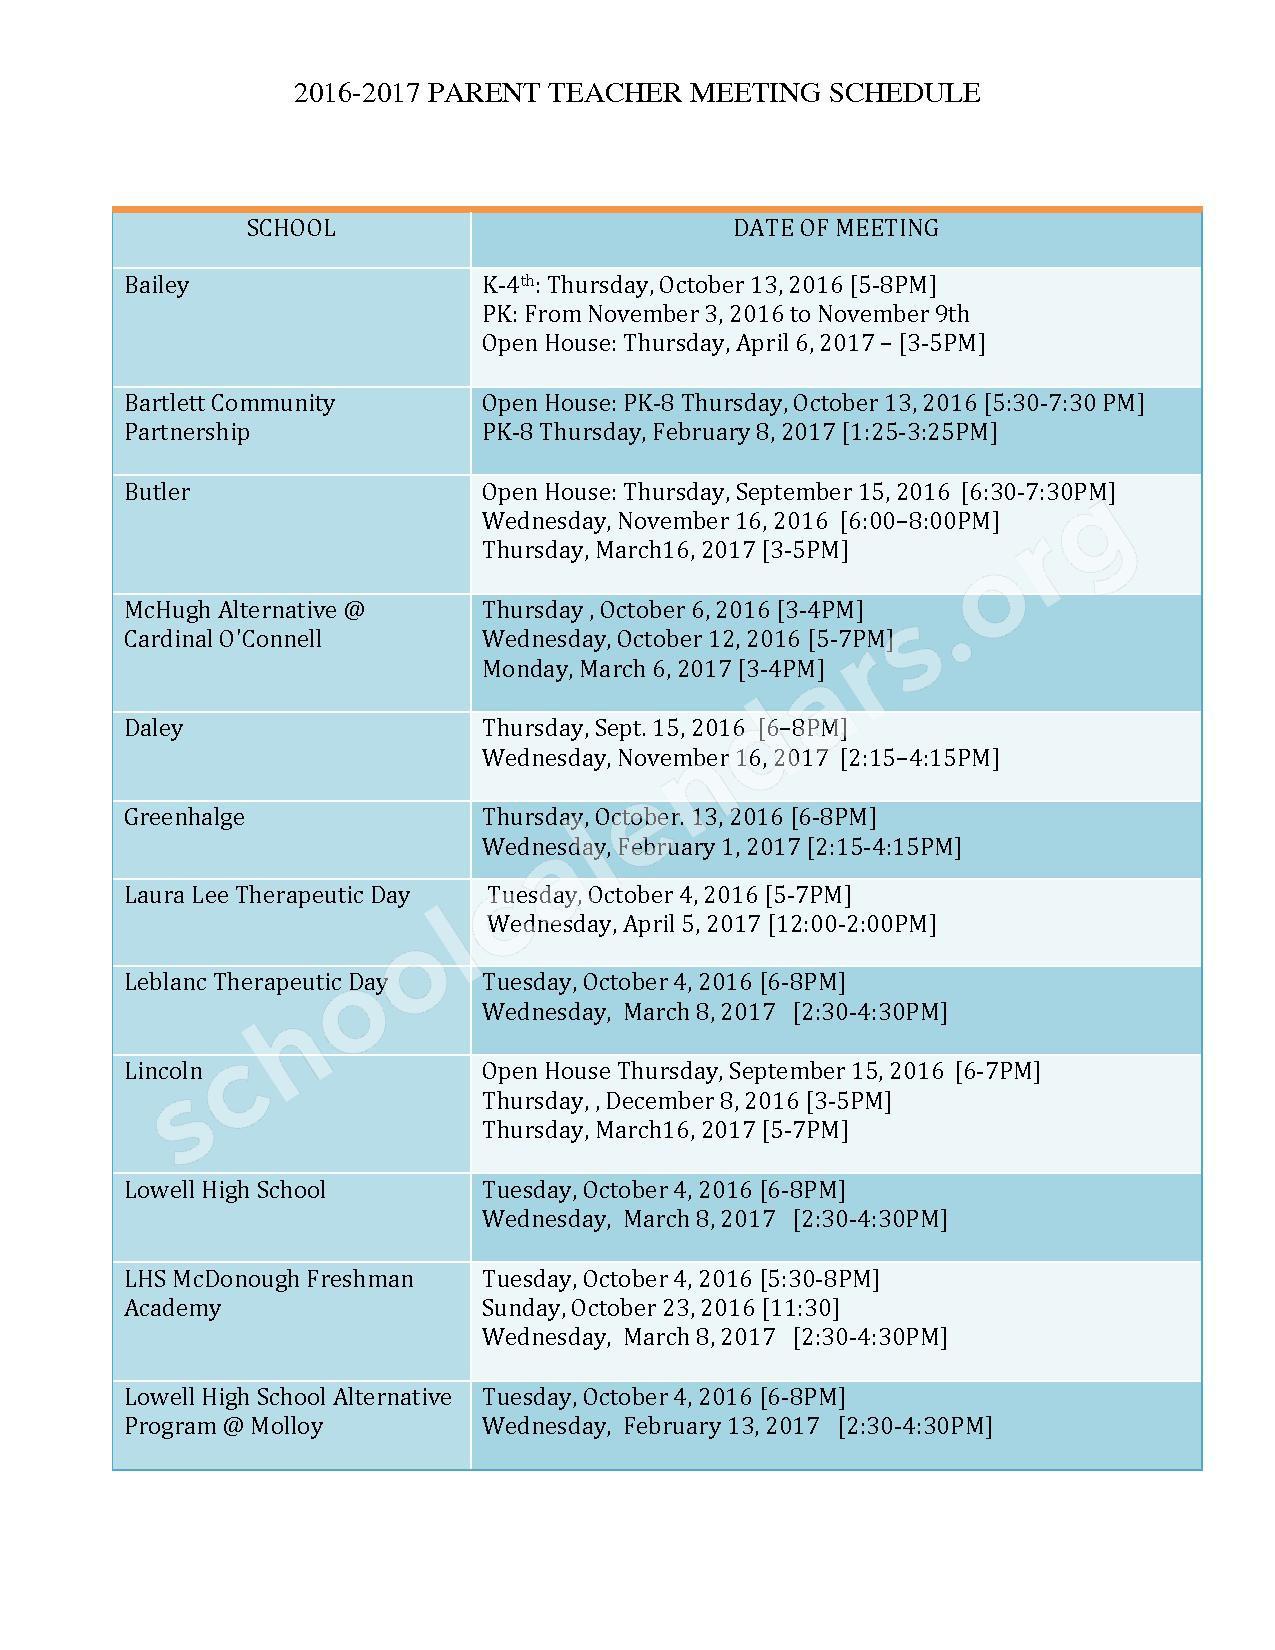 Parent Teacher Meeting Schedule 2016 - 2017 – Peter W Reilly – page 1